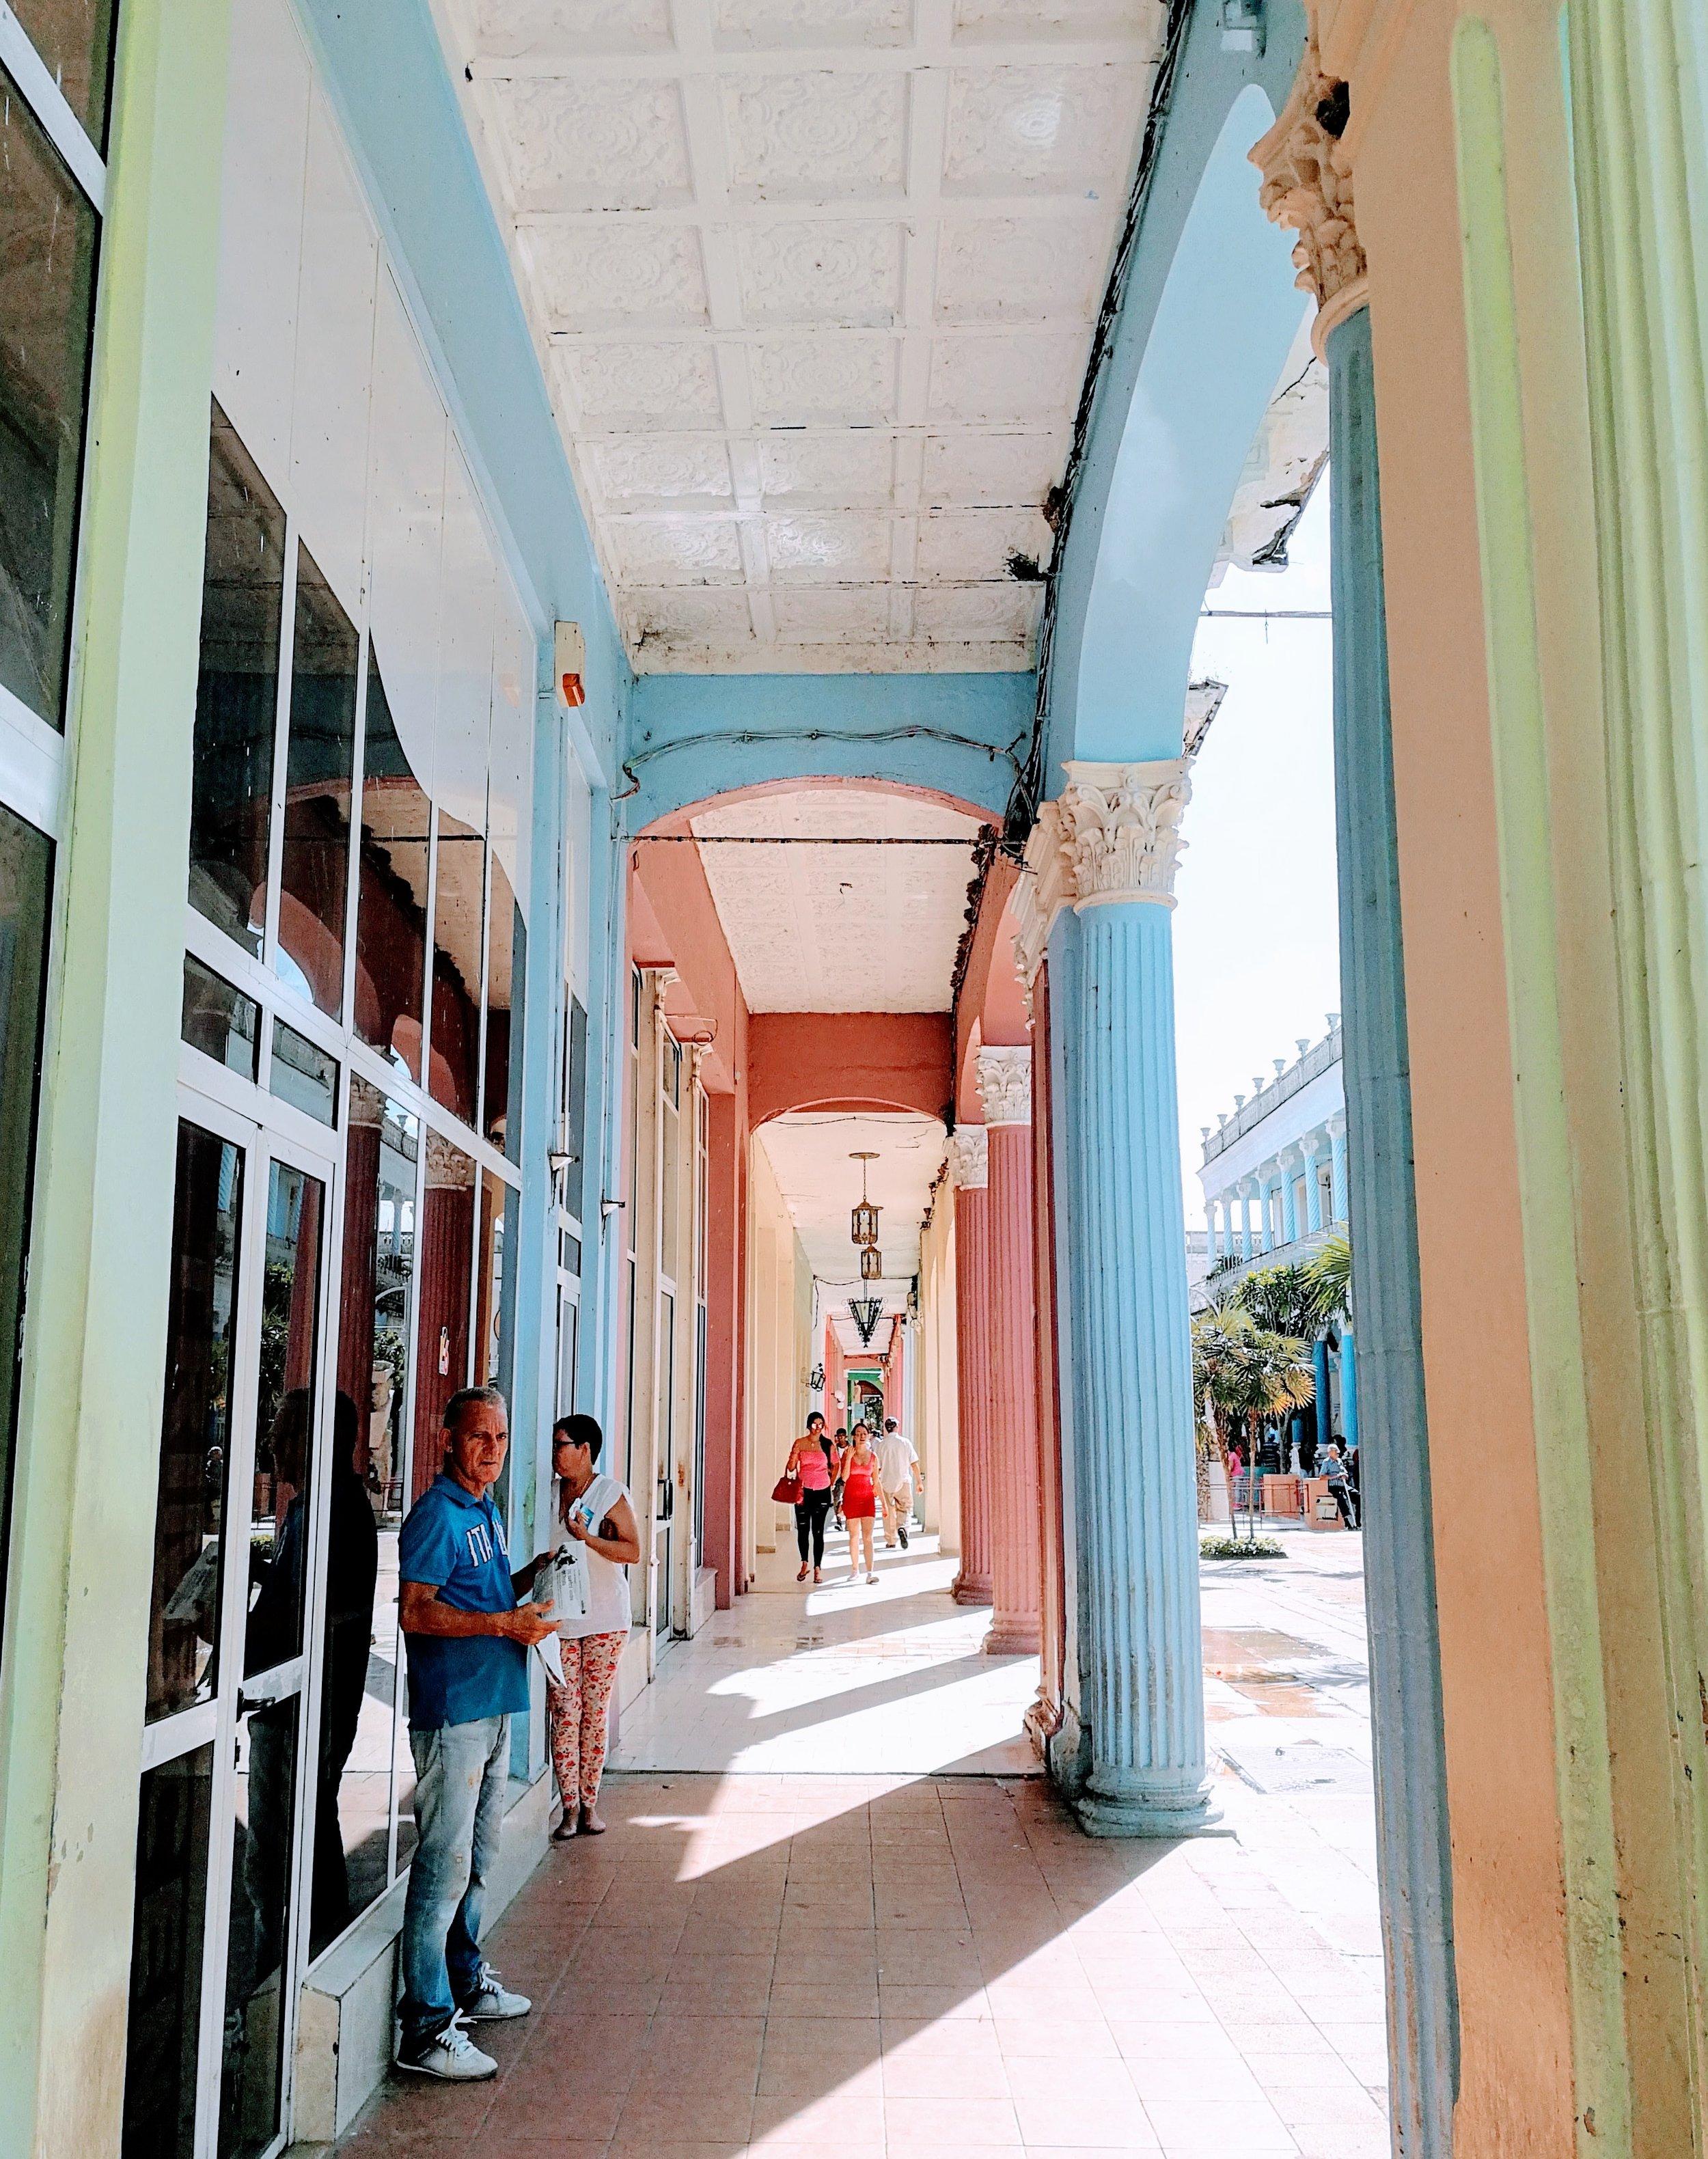 Calle Independencia in Ciego de Avila, Cuba